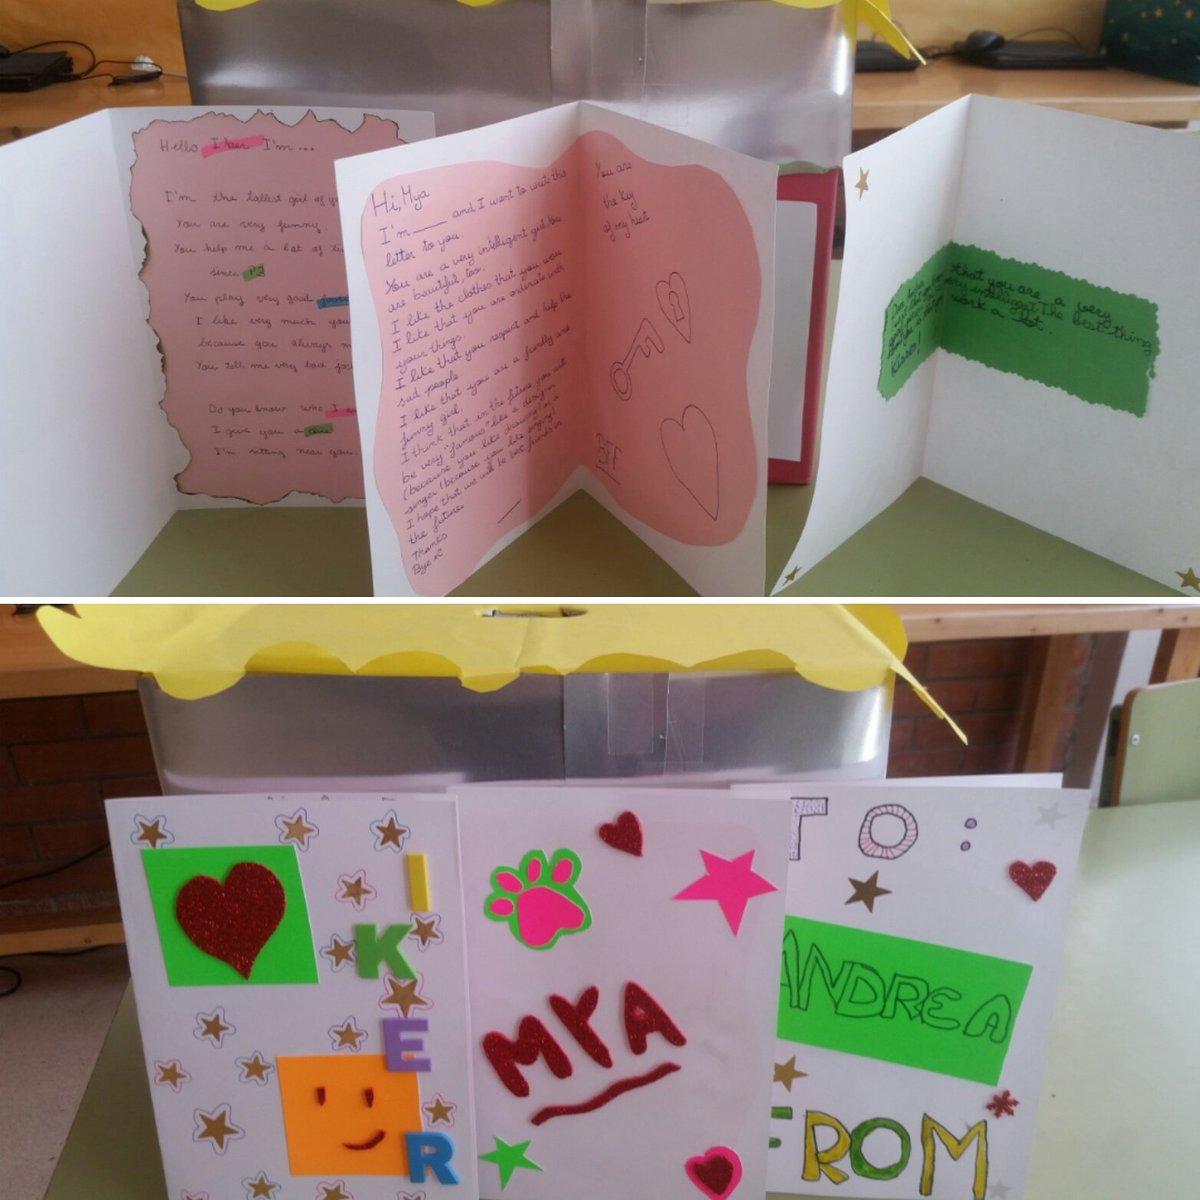 #Feliç #dilluns #Happy #Monday Impulsem els #valors, l&#39;#Equip i l&#39;#escriptura. The Wishing Box. #inthenewschool #WishingBox #education<br>http://pic.twitter.com/sKpT6Fml0k